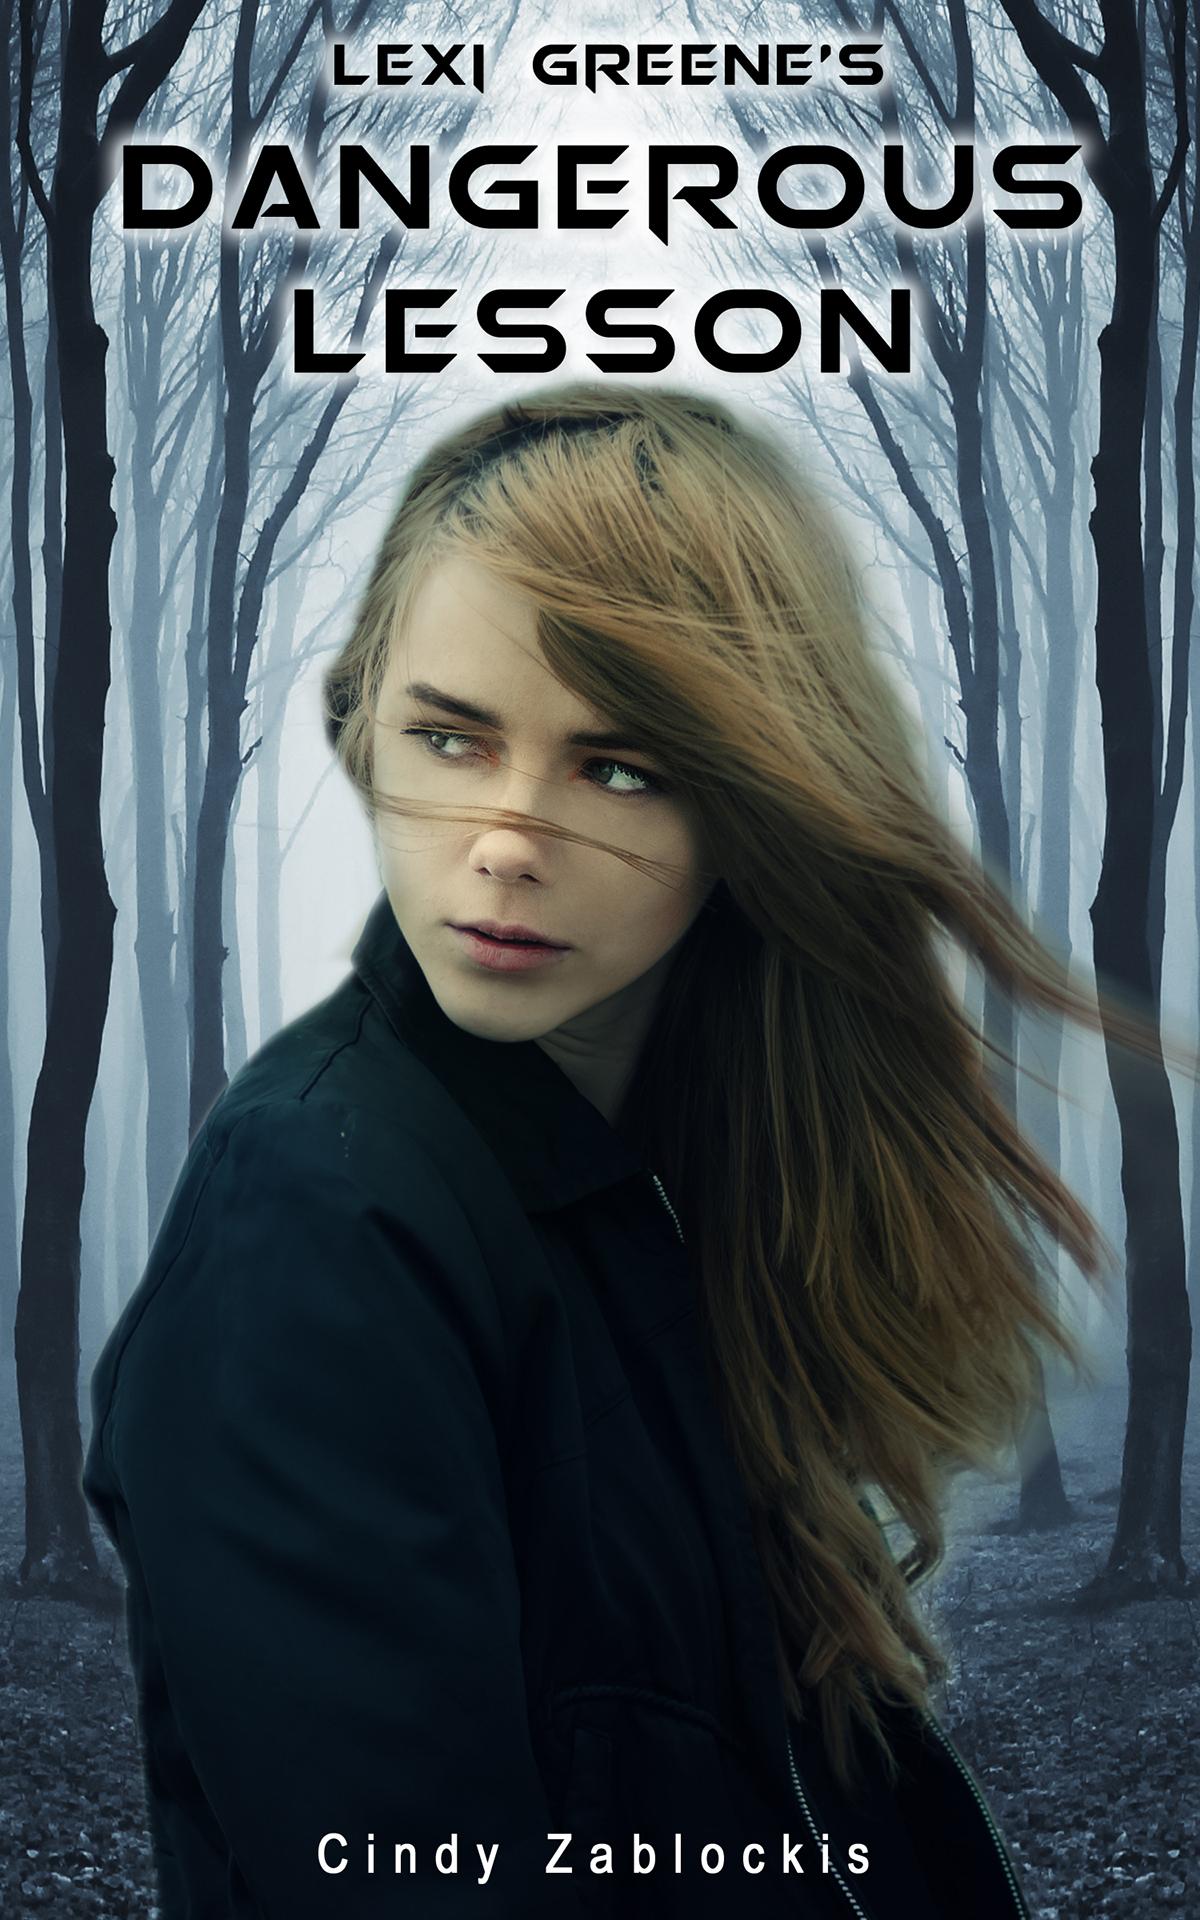 Book Cover Design photoshop